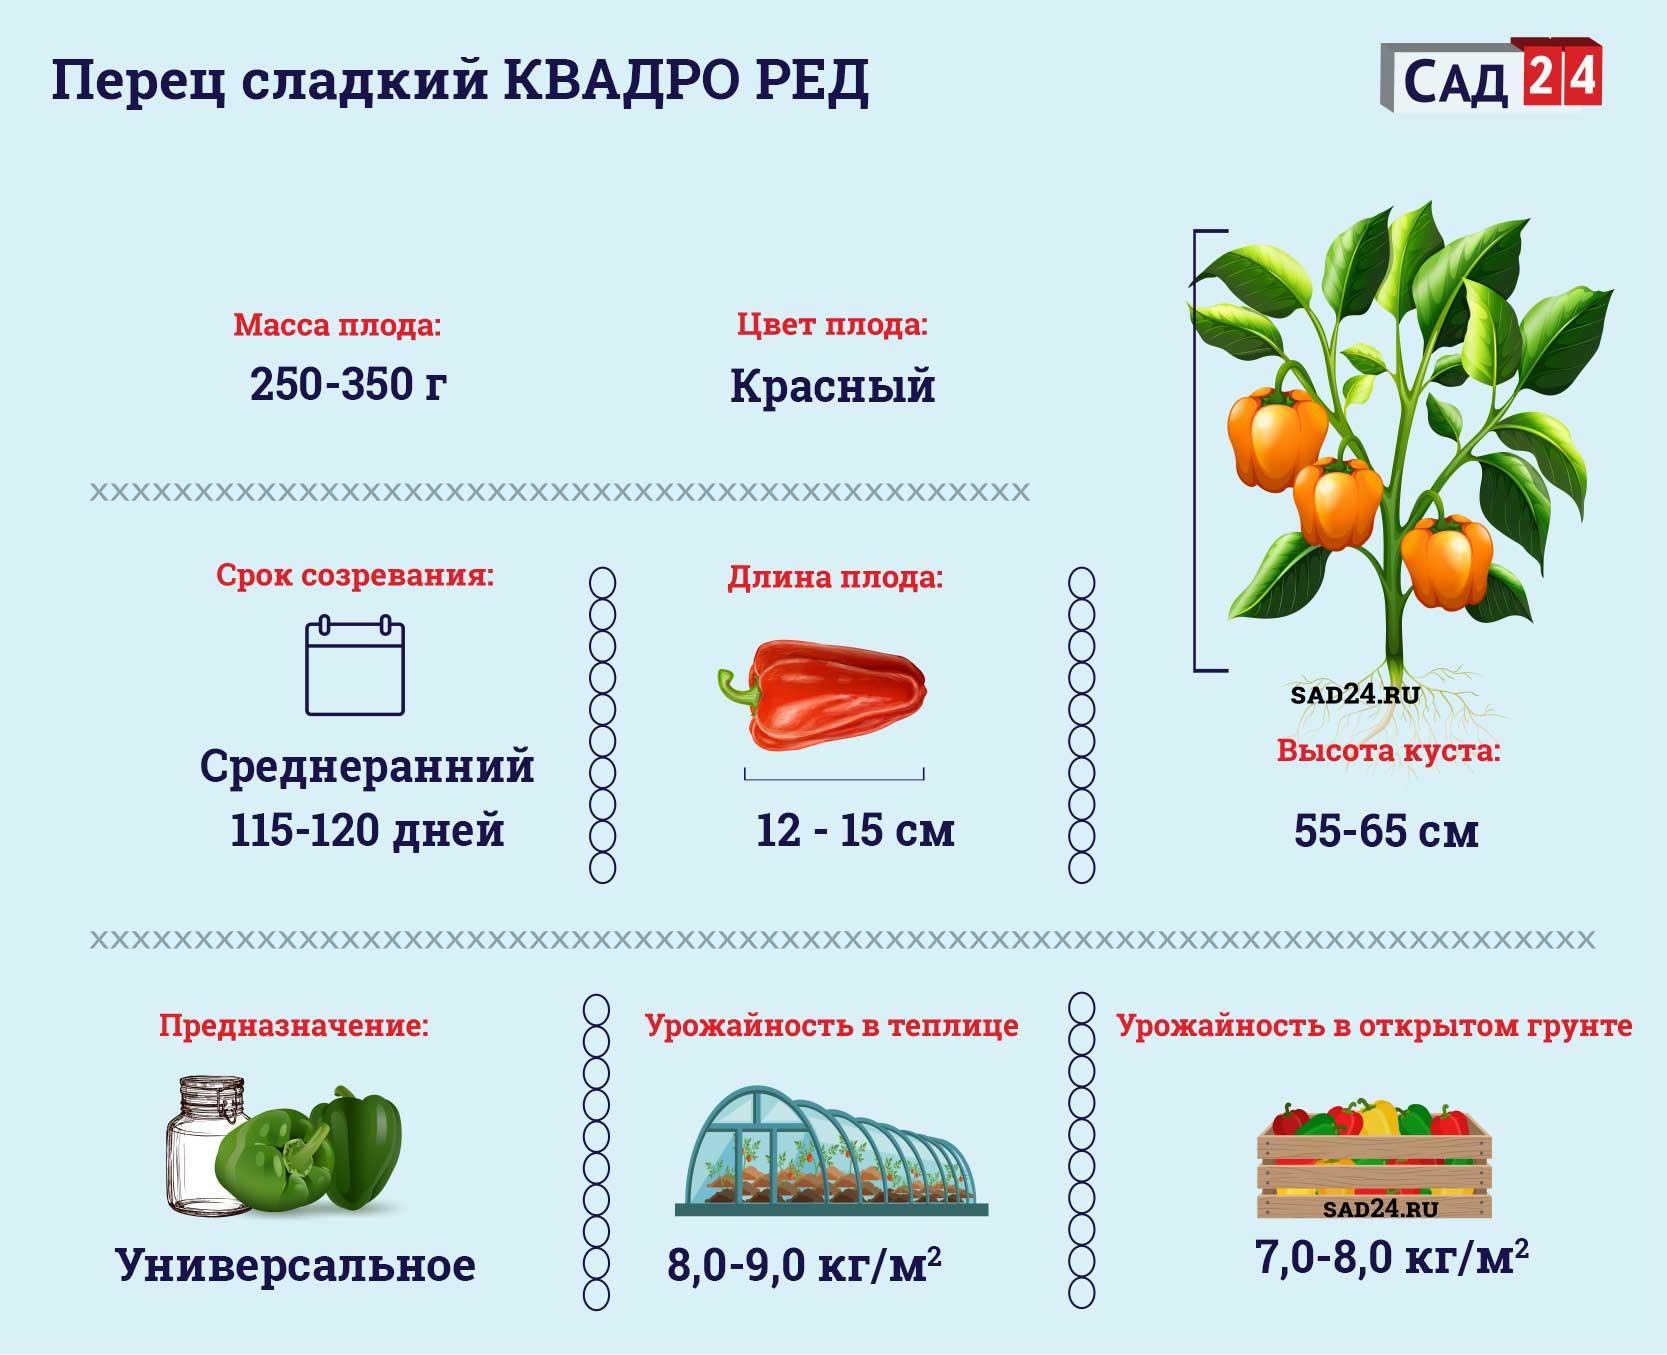 Квадро ред - https://sad24.ru